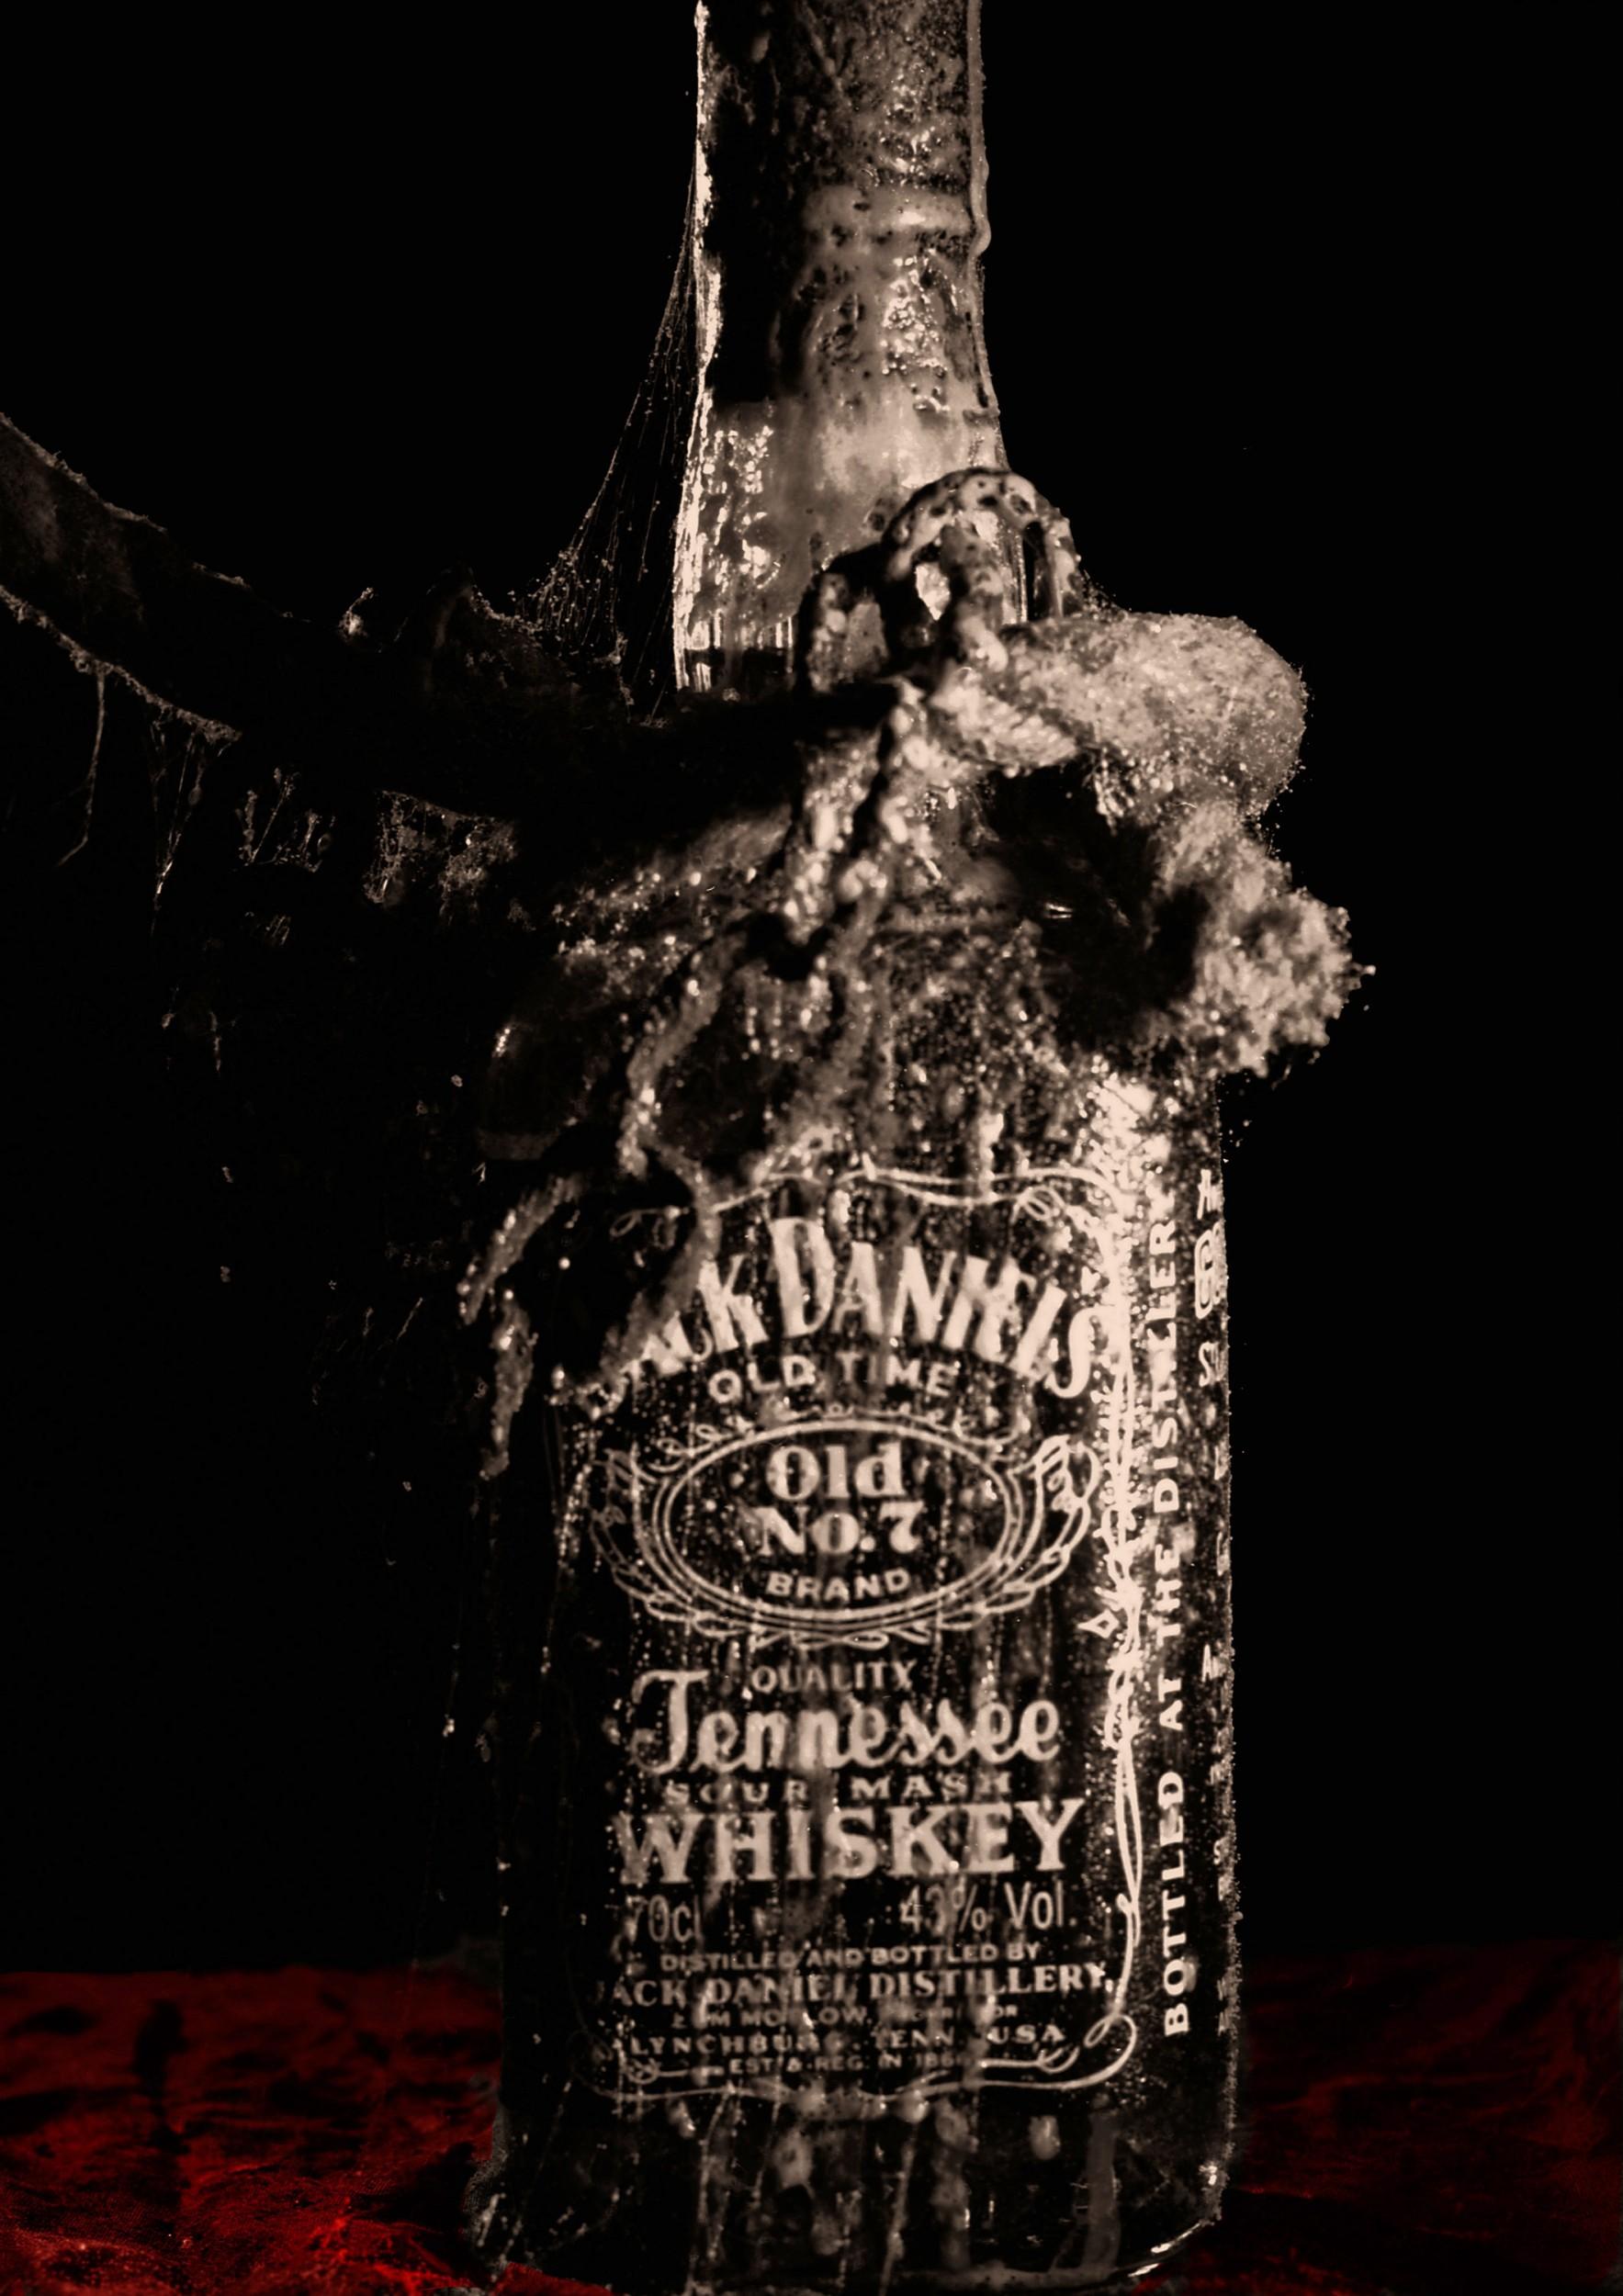 Jack Daniel S Art Gallery Imagineymag Art Artwork